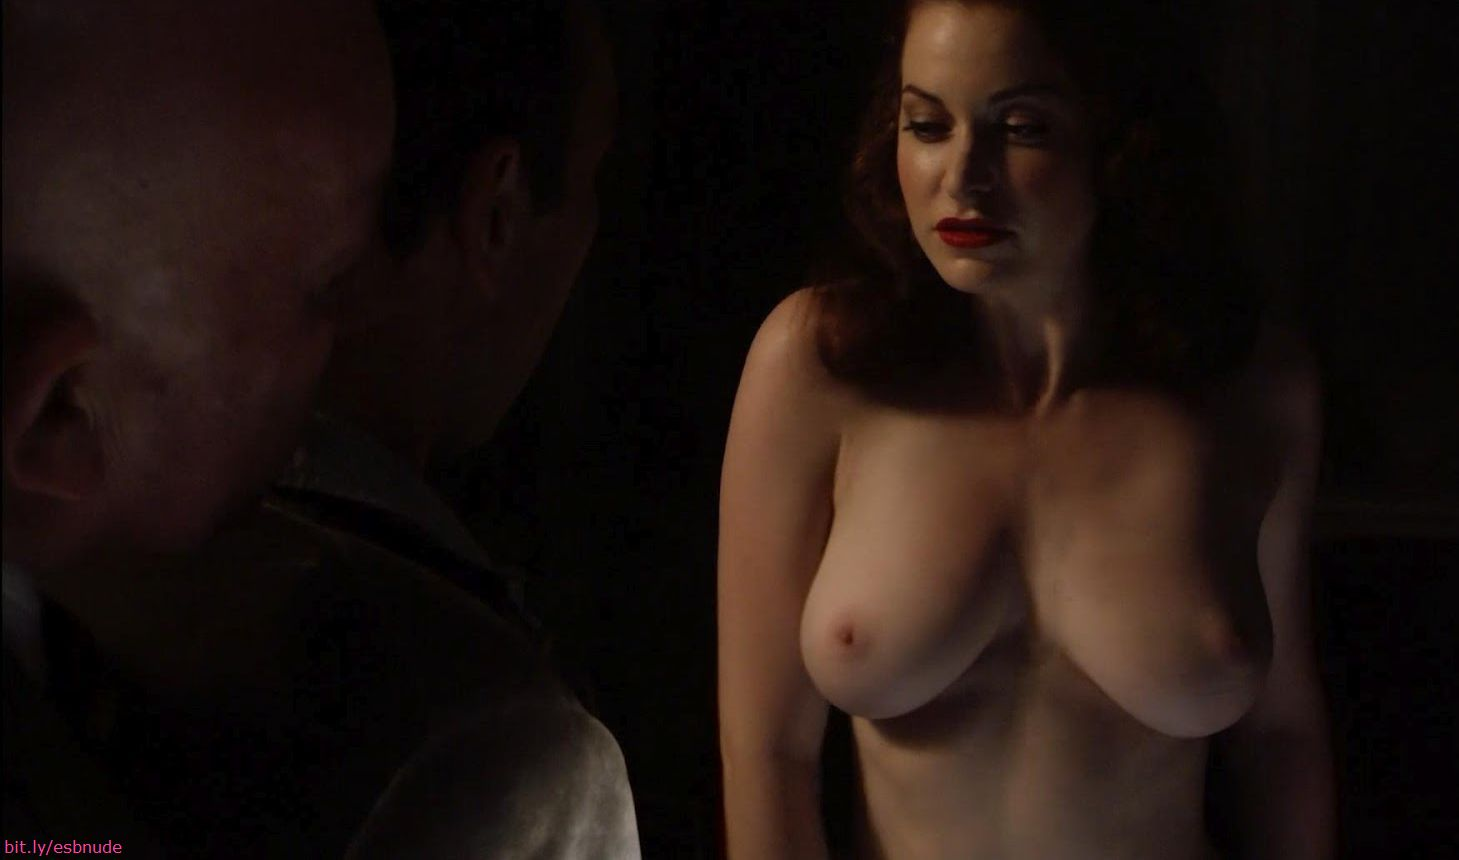 Esme bianco game of thrones nude scenes